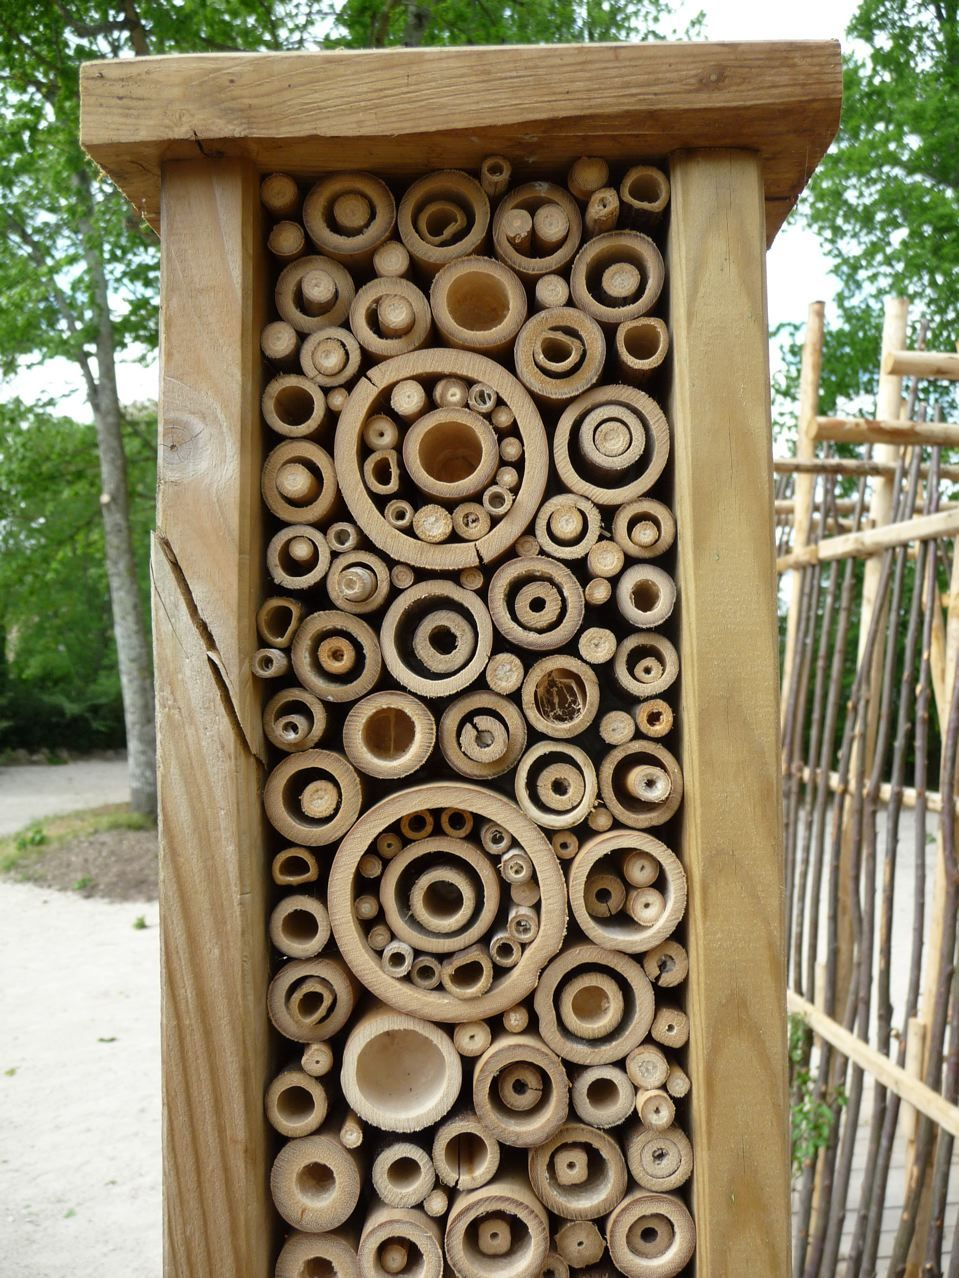 Bug Hotel  Hlm  U00e0 Insectes De Michel Davo  Le Jardin D